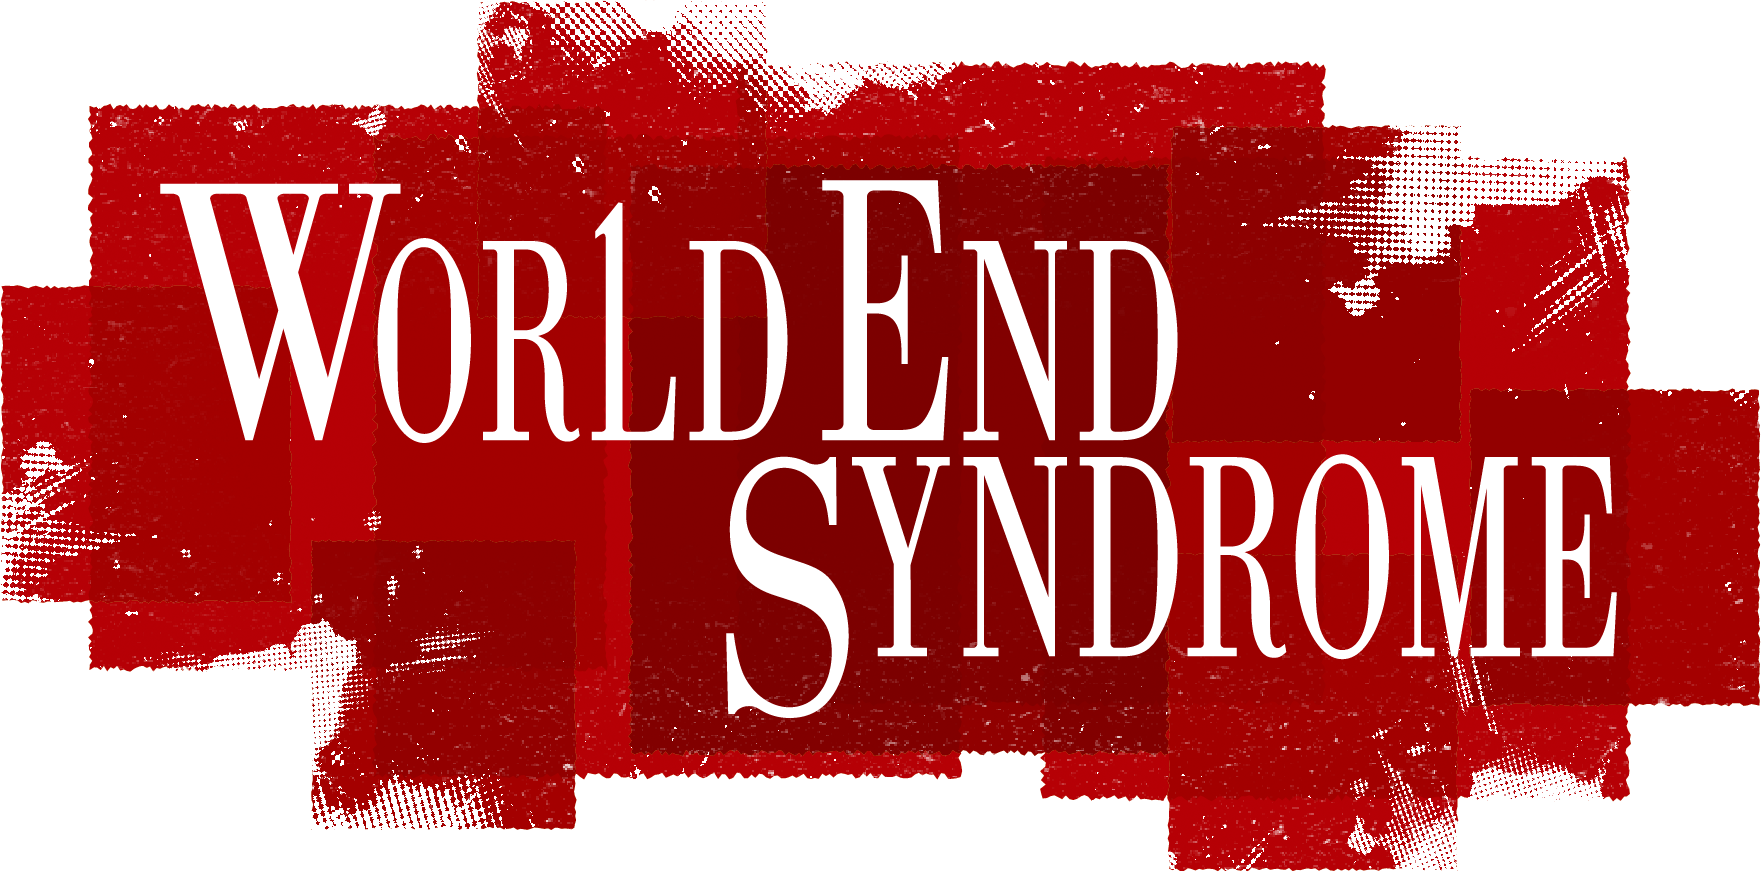 WorldEnd Syndrome de Arc System Works llega a las tiendas